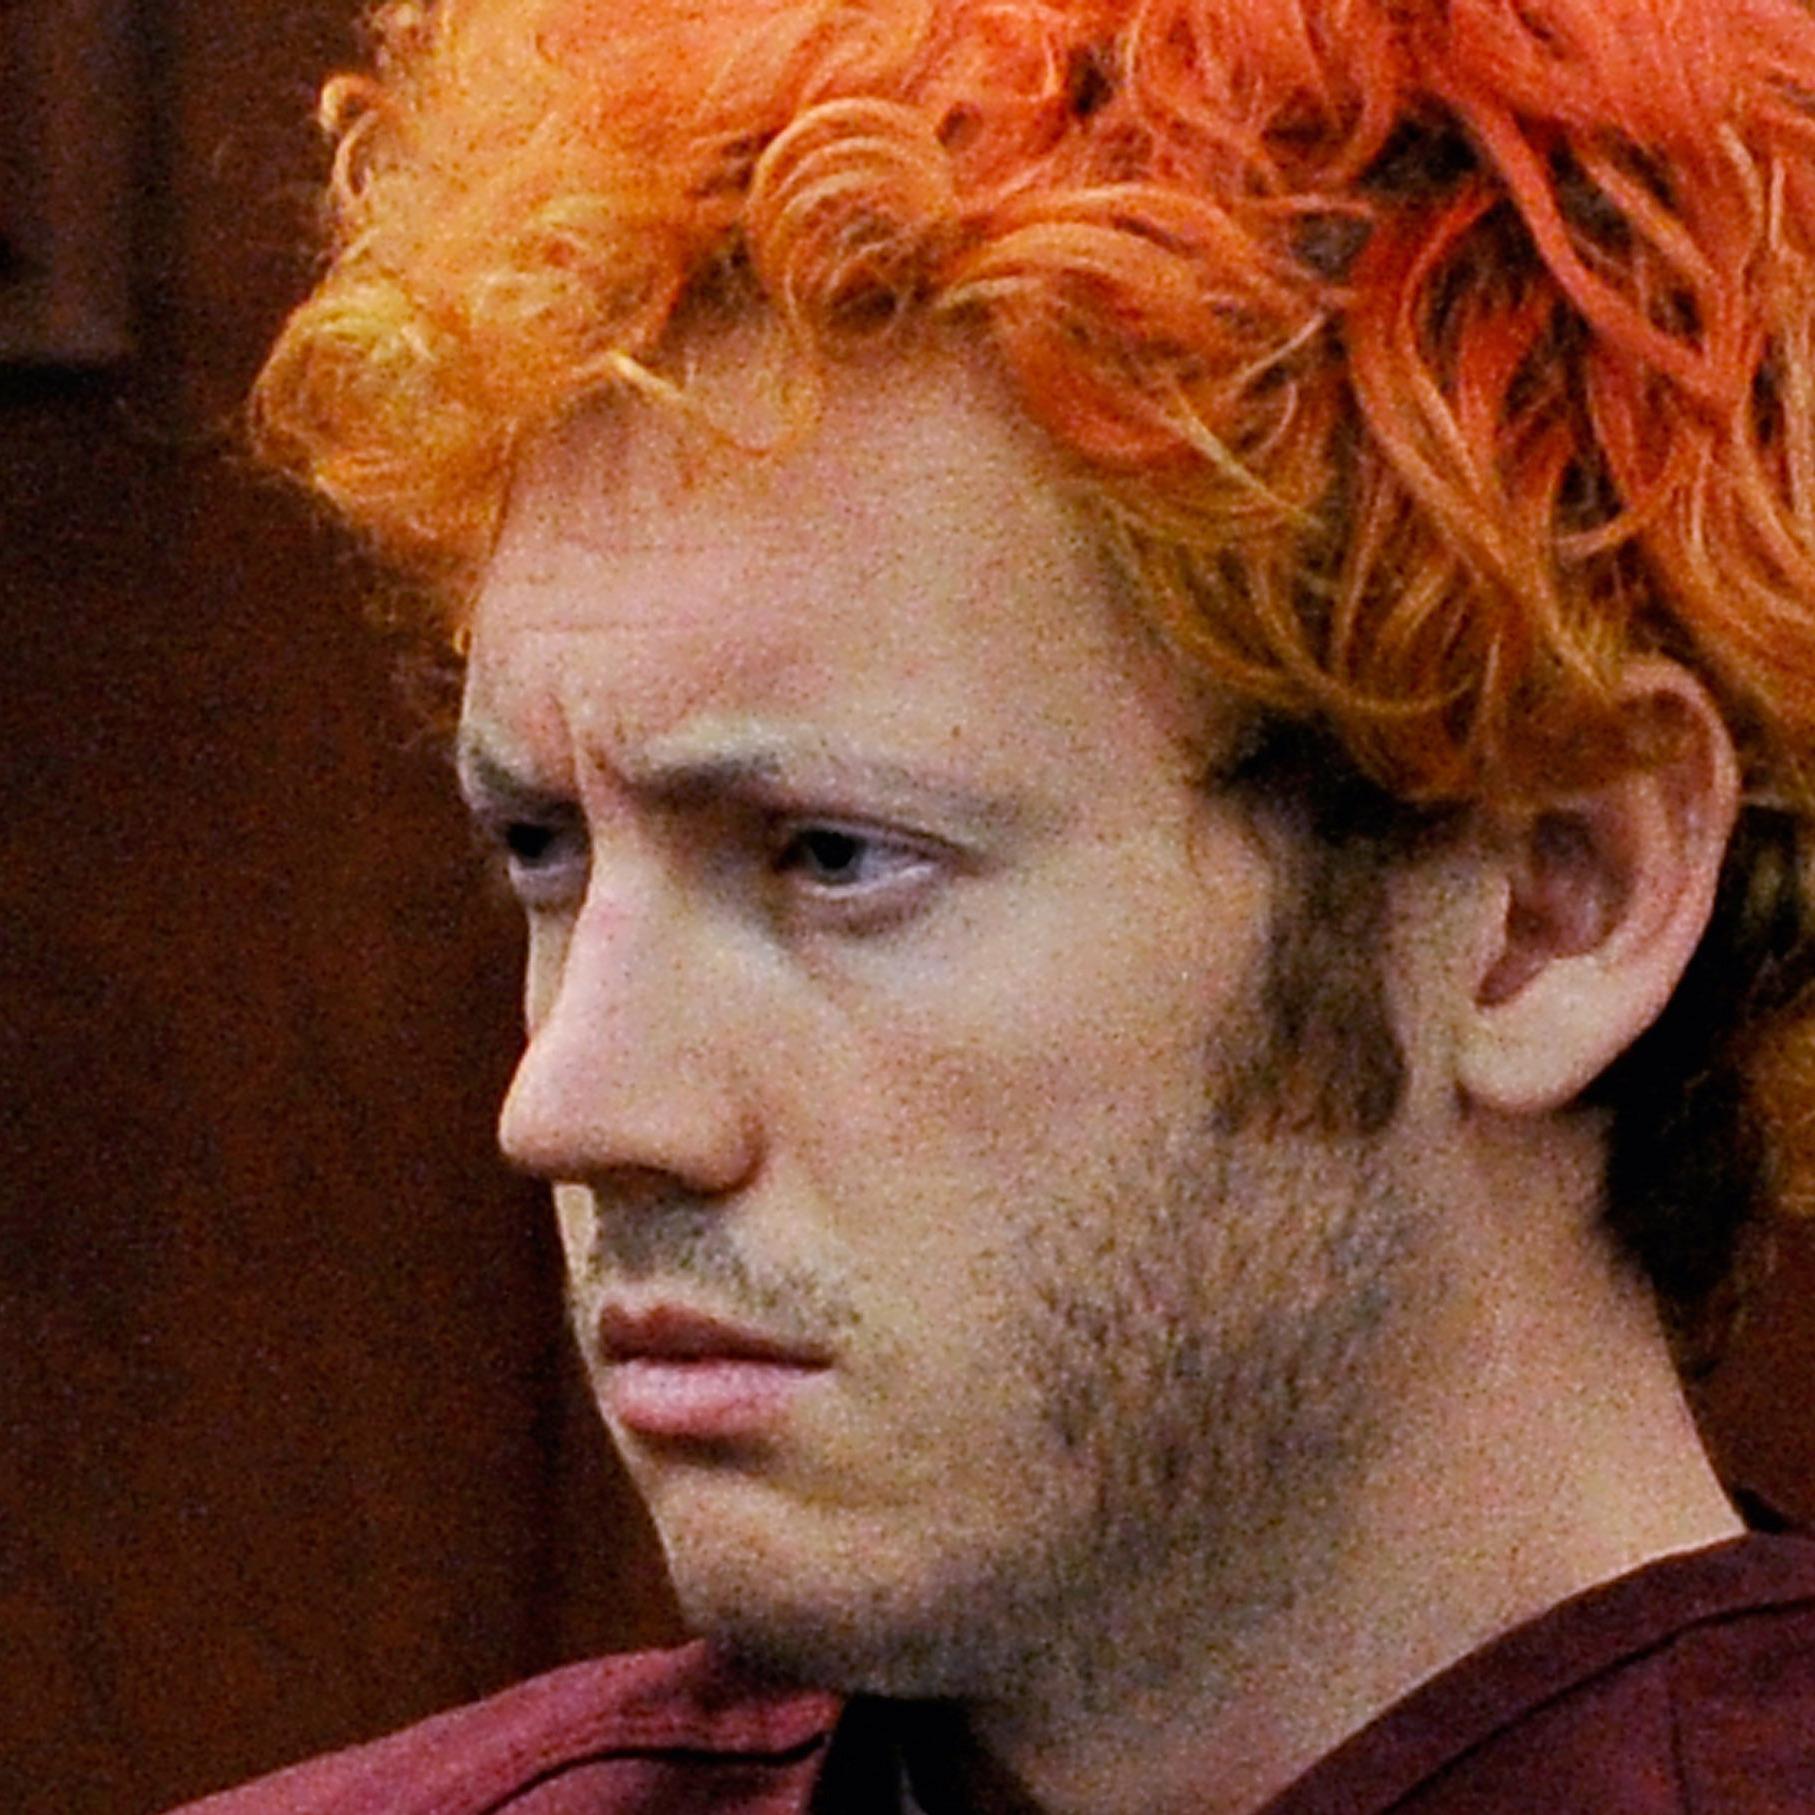 Aurora Shooter: Psychiatrist Was Alarmed By Aurora Shooting Suspect's